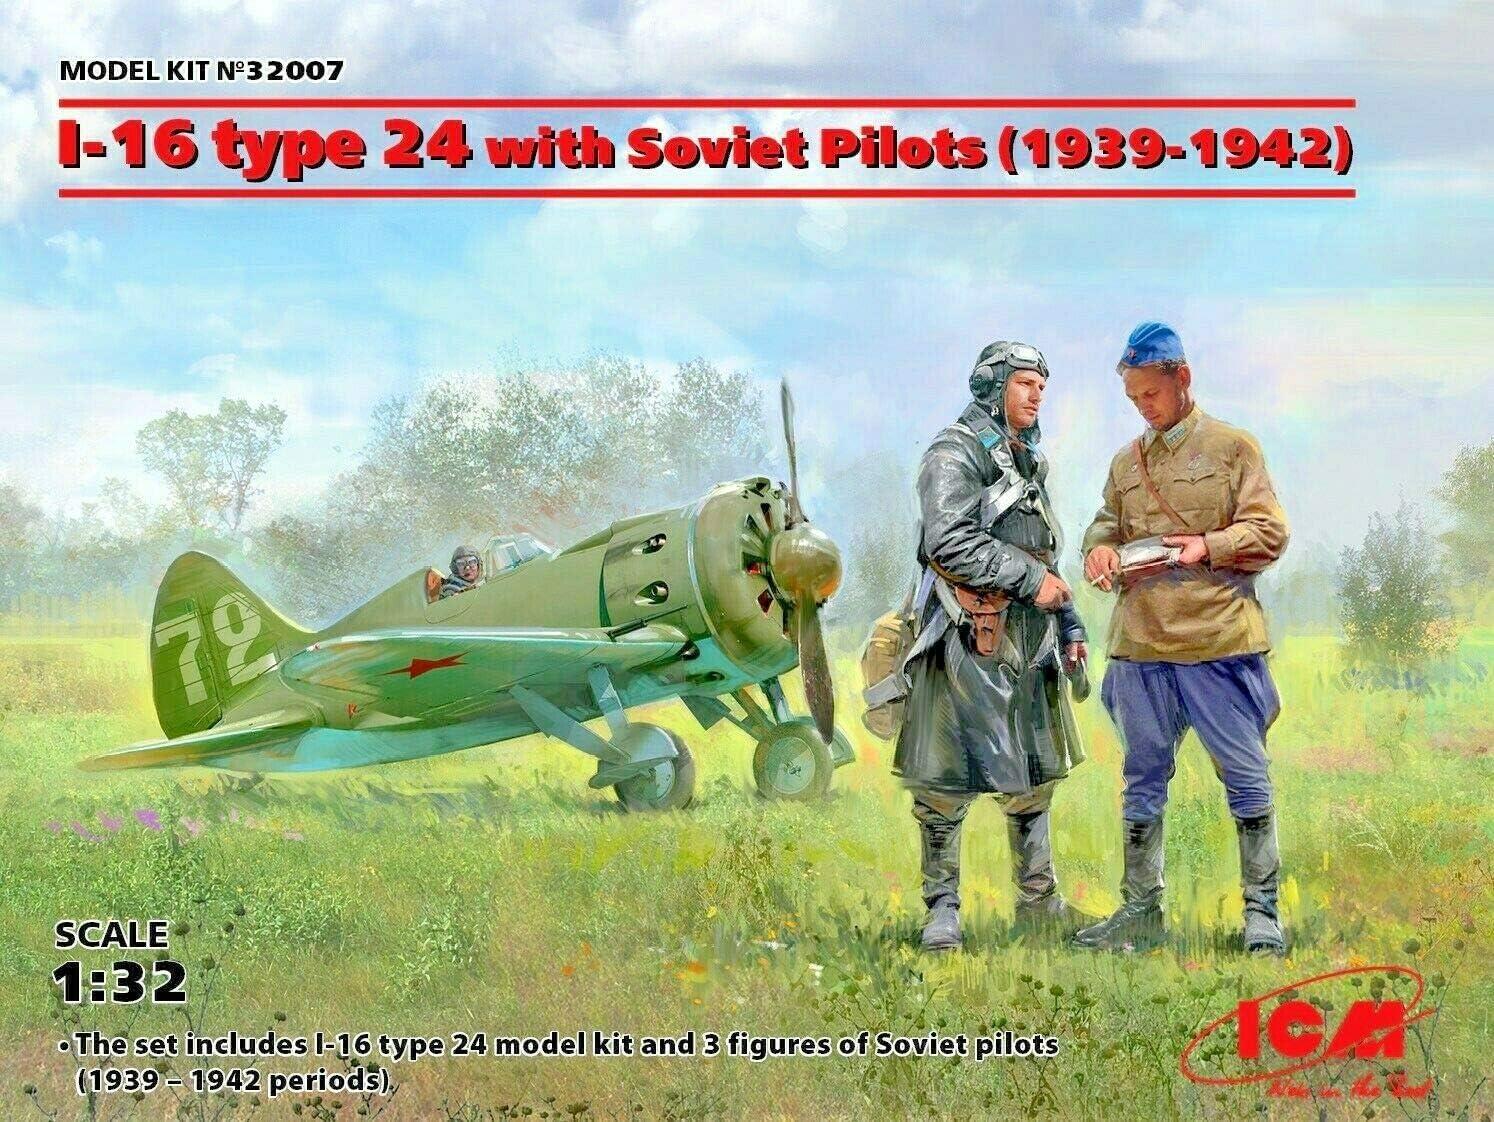 Neu WWII Soviet Fighter ICM 32003-1:32 I-16 type 29